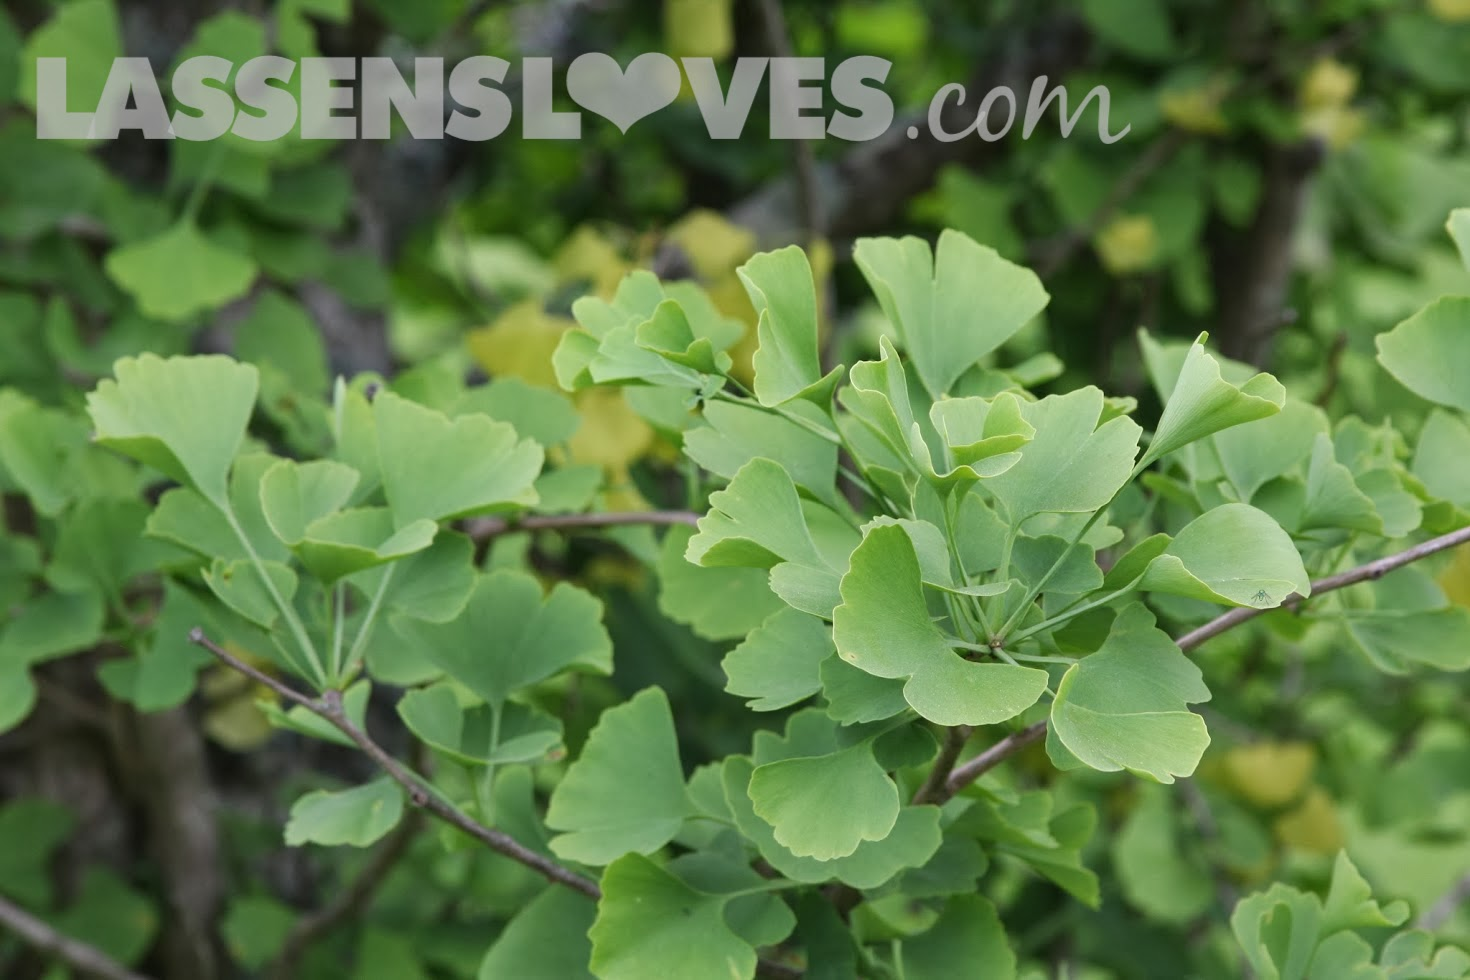 lassensloves.com, Lassen's, Lassens, Gaia+Herbs, Gingo, Mental+Alertness